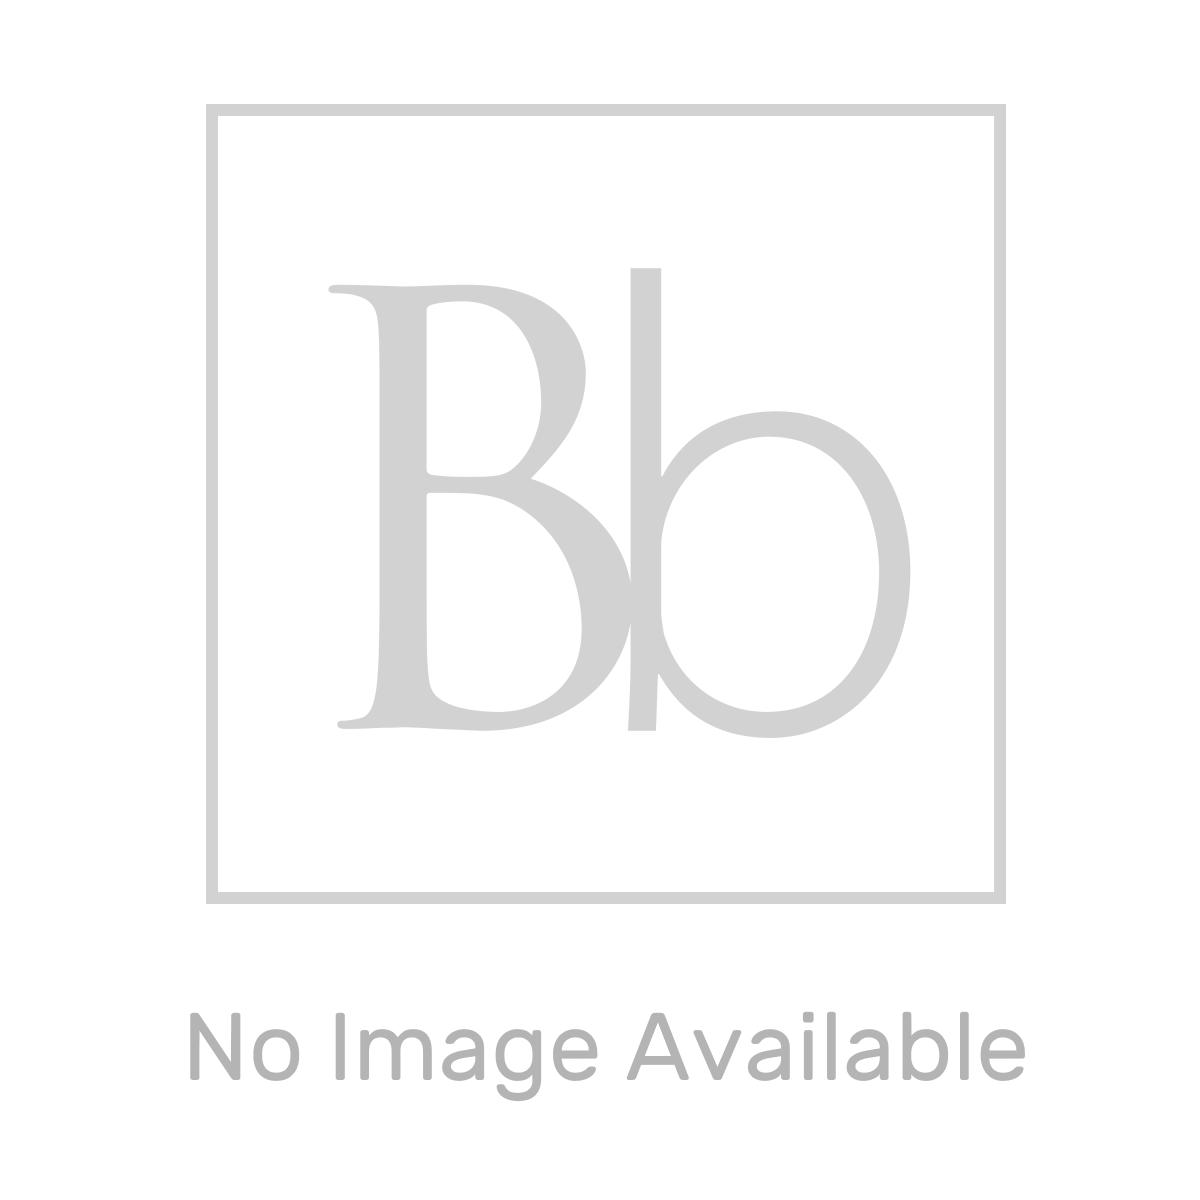 Sensio Cora Dome LED Ceiling Light